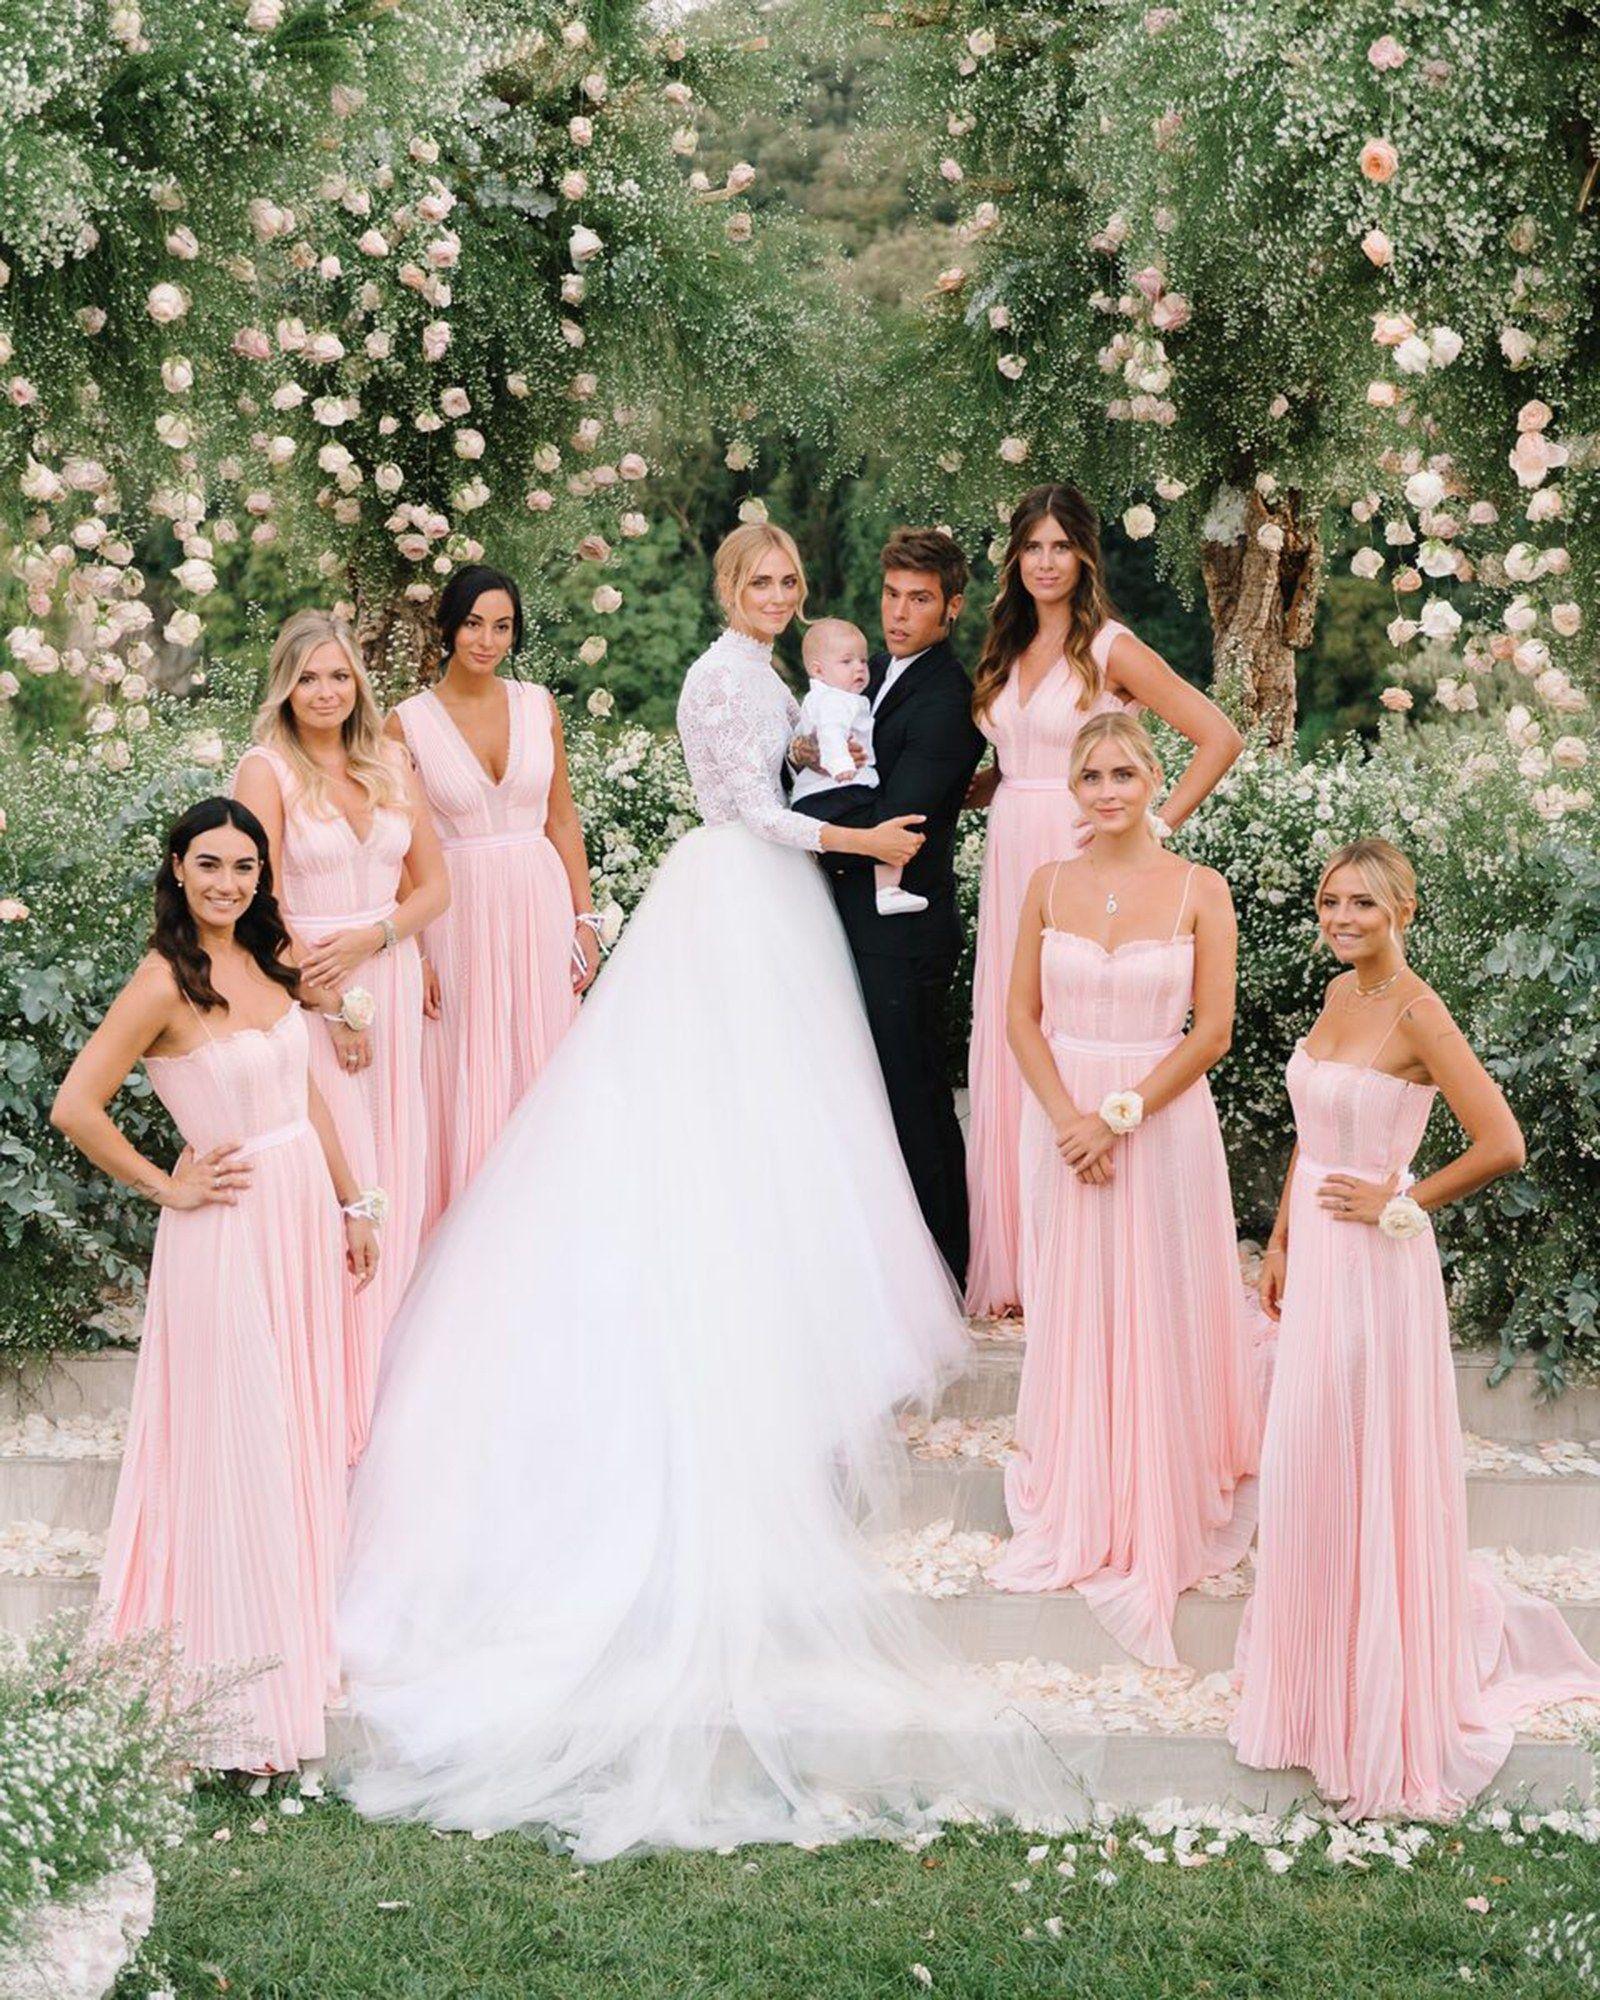 An Inside Look At Chiara Ferragni's Wedding Extravaganza